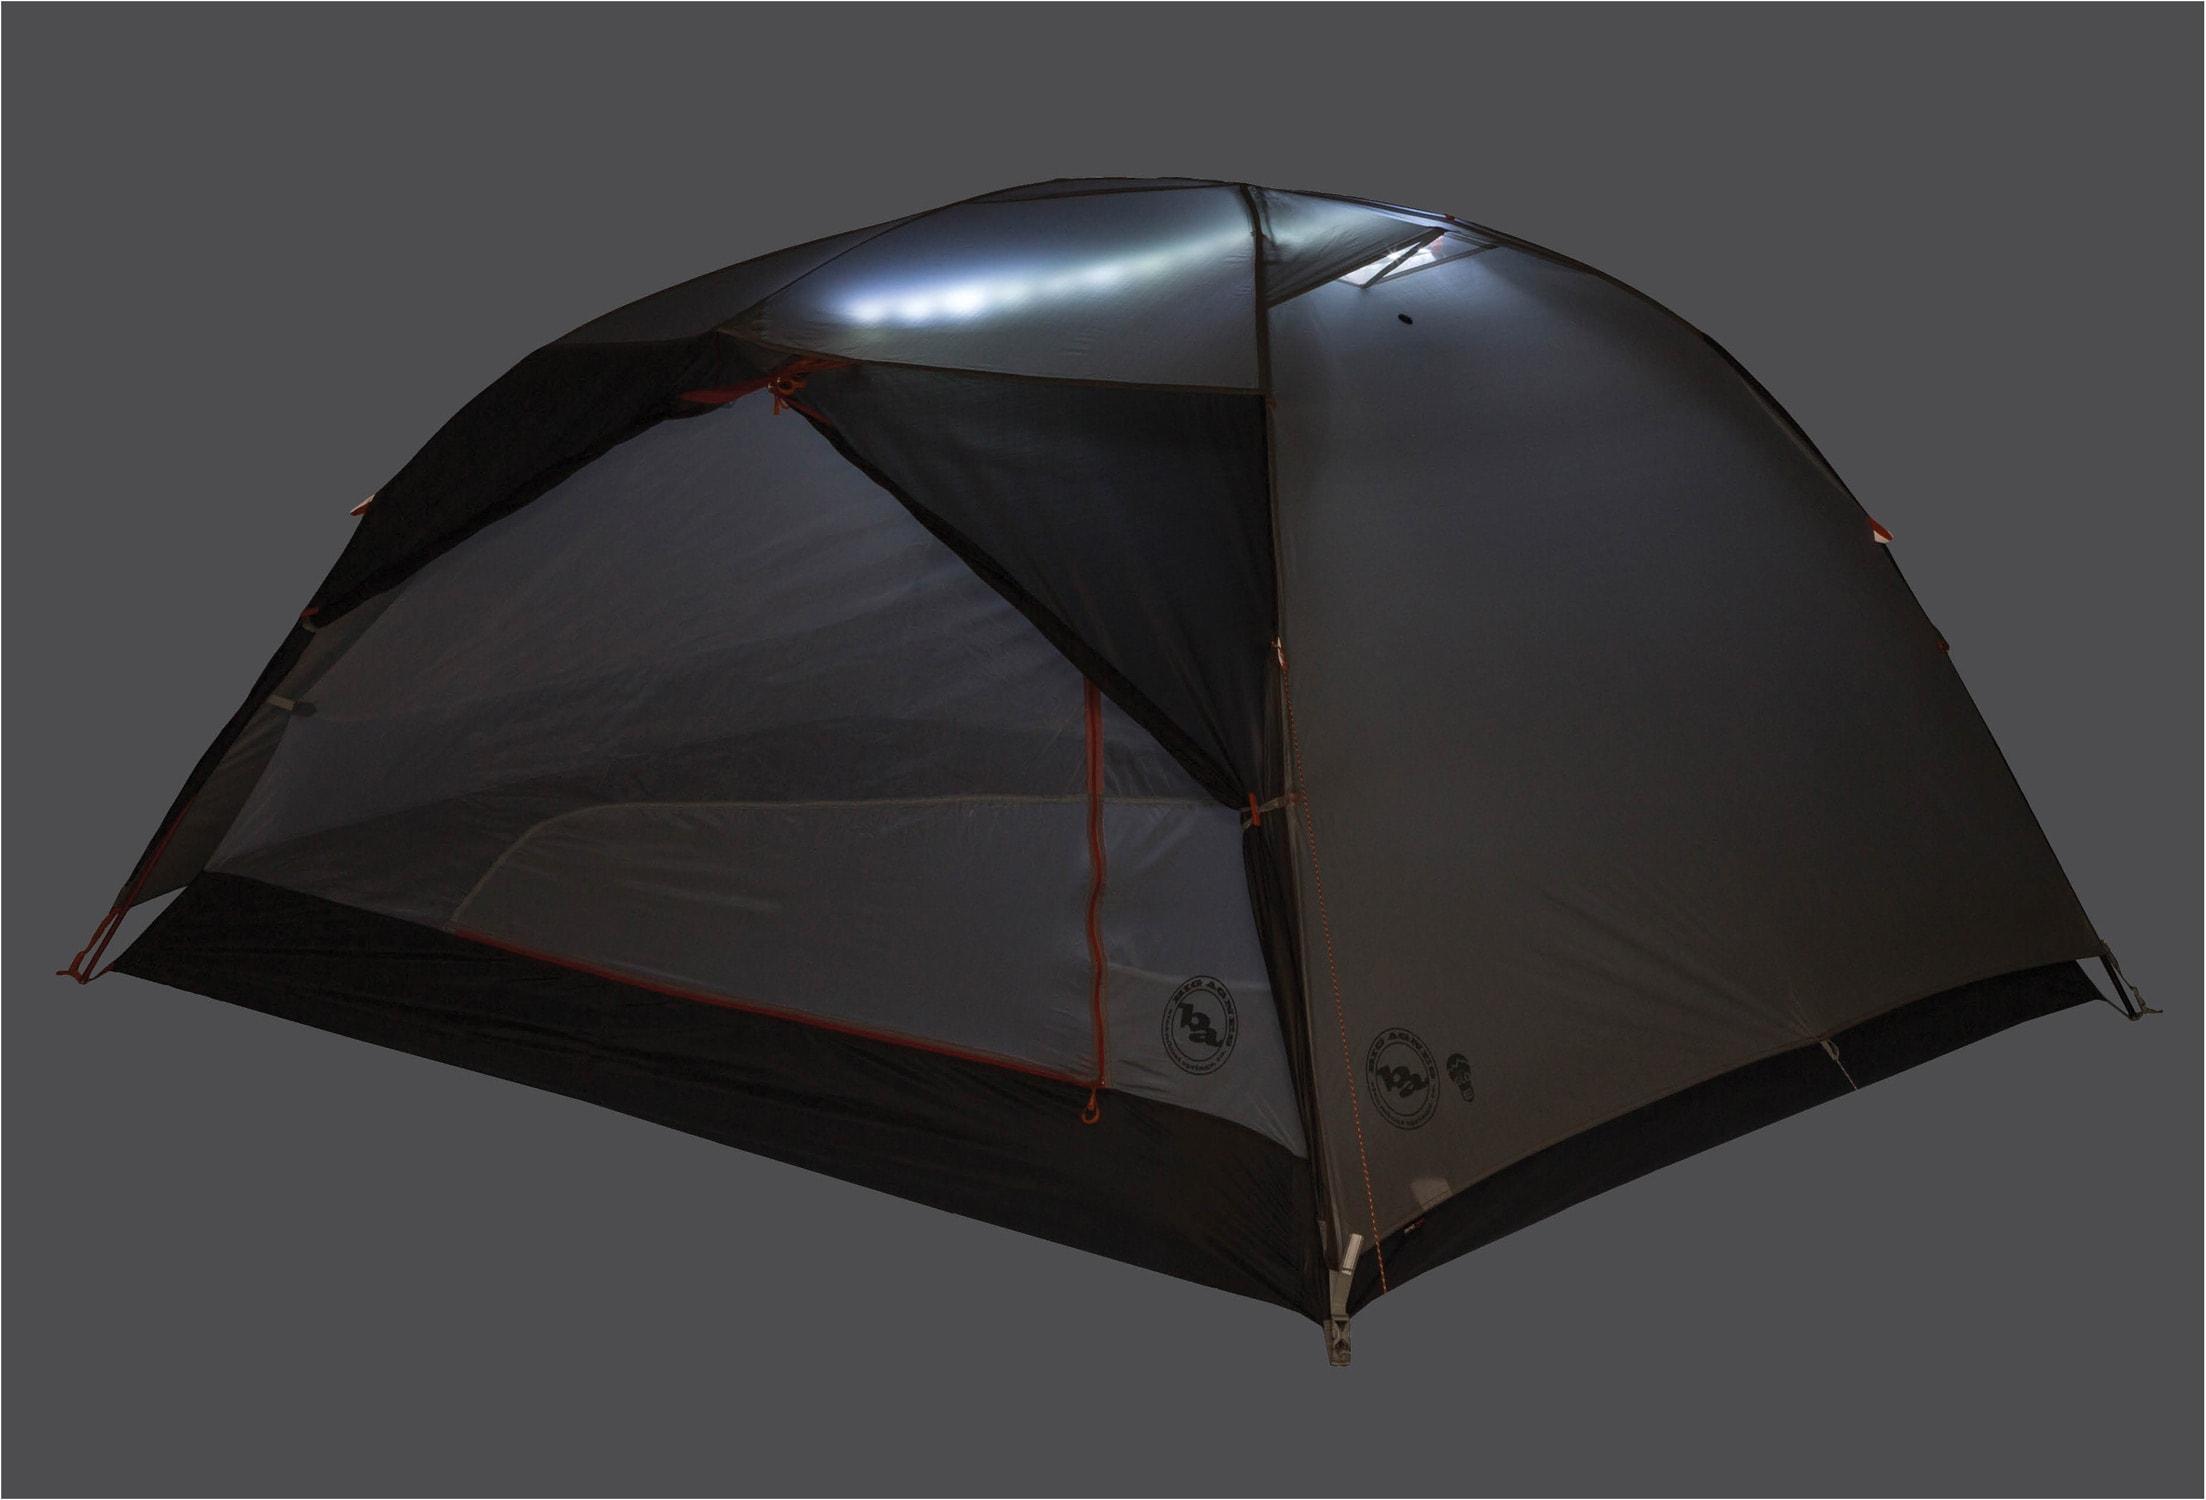 Big Agnes Copper Spur Hv Ul 3 Mtnglo Tent 2018